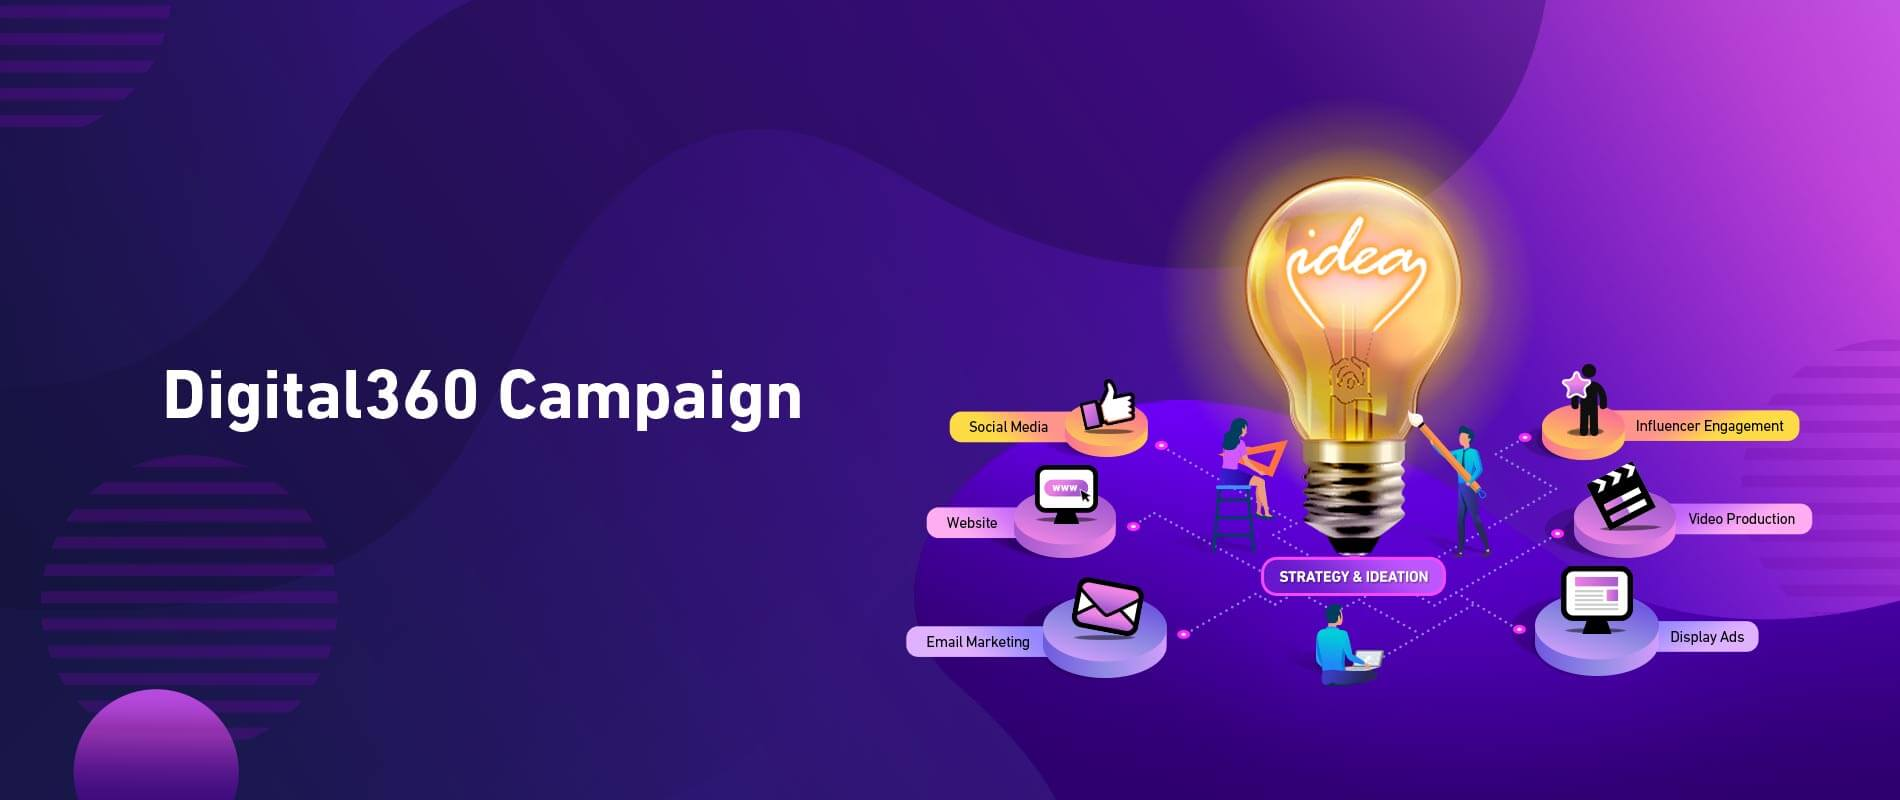 Digital360 Campaign